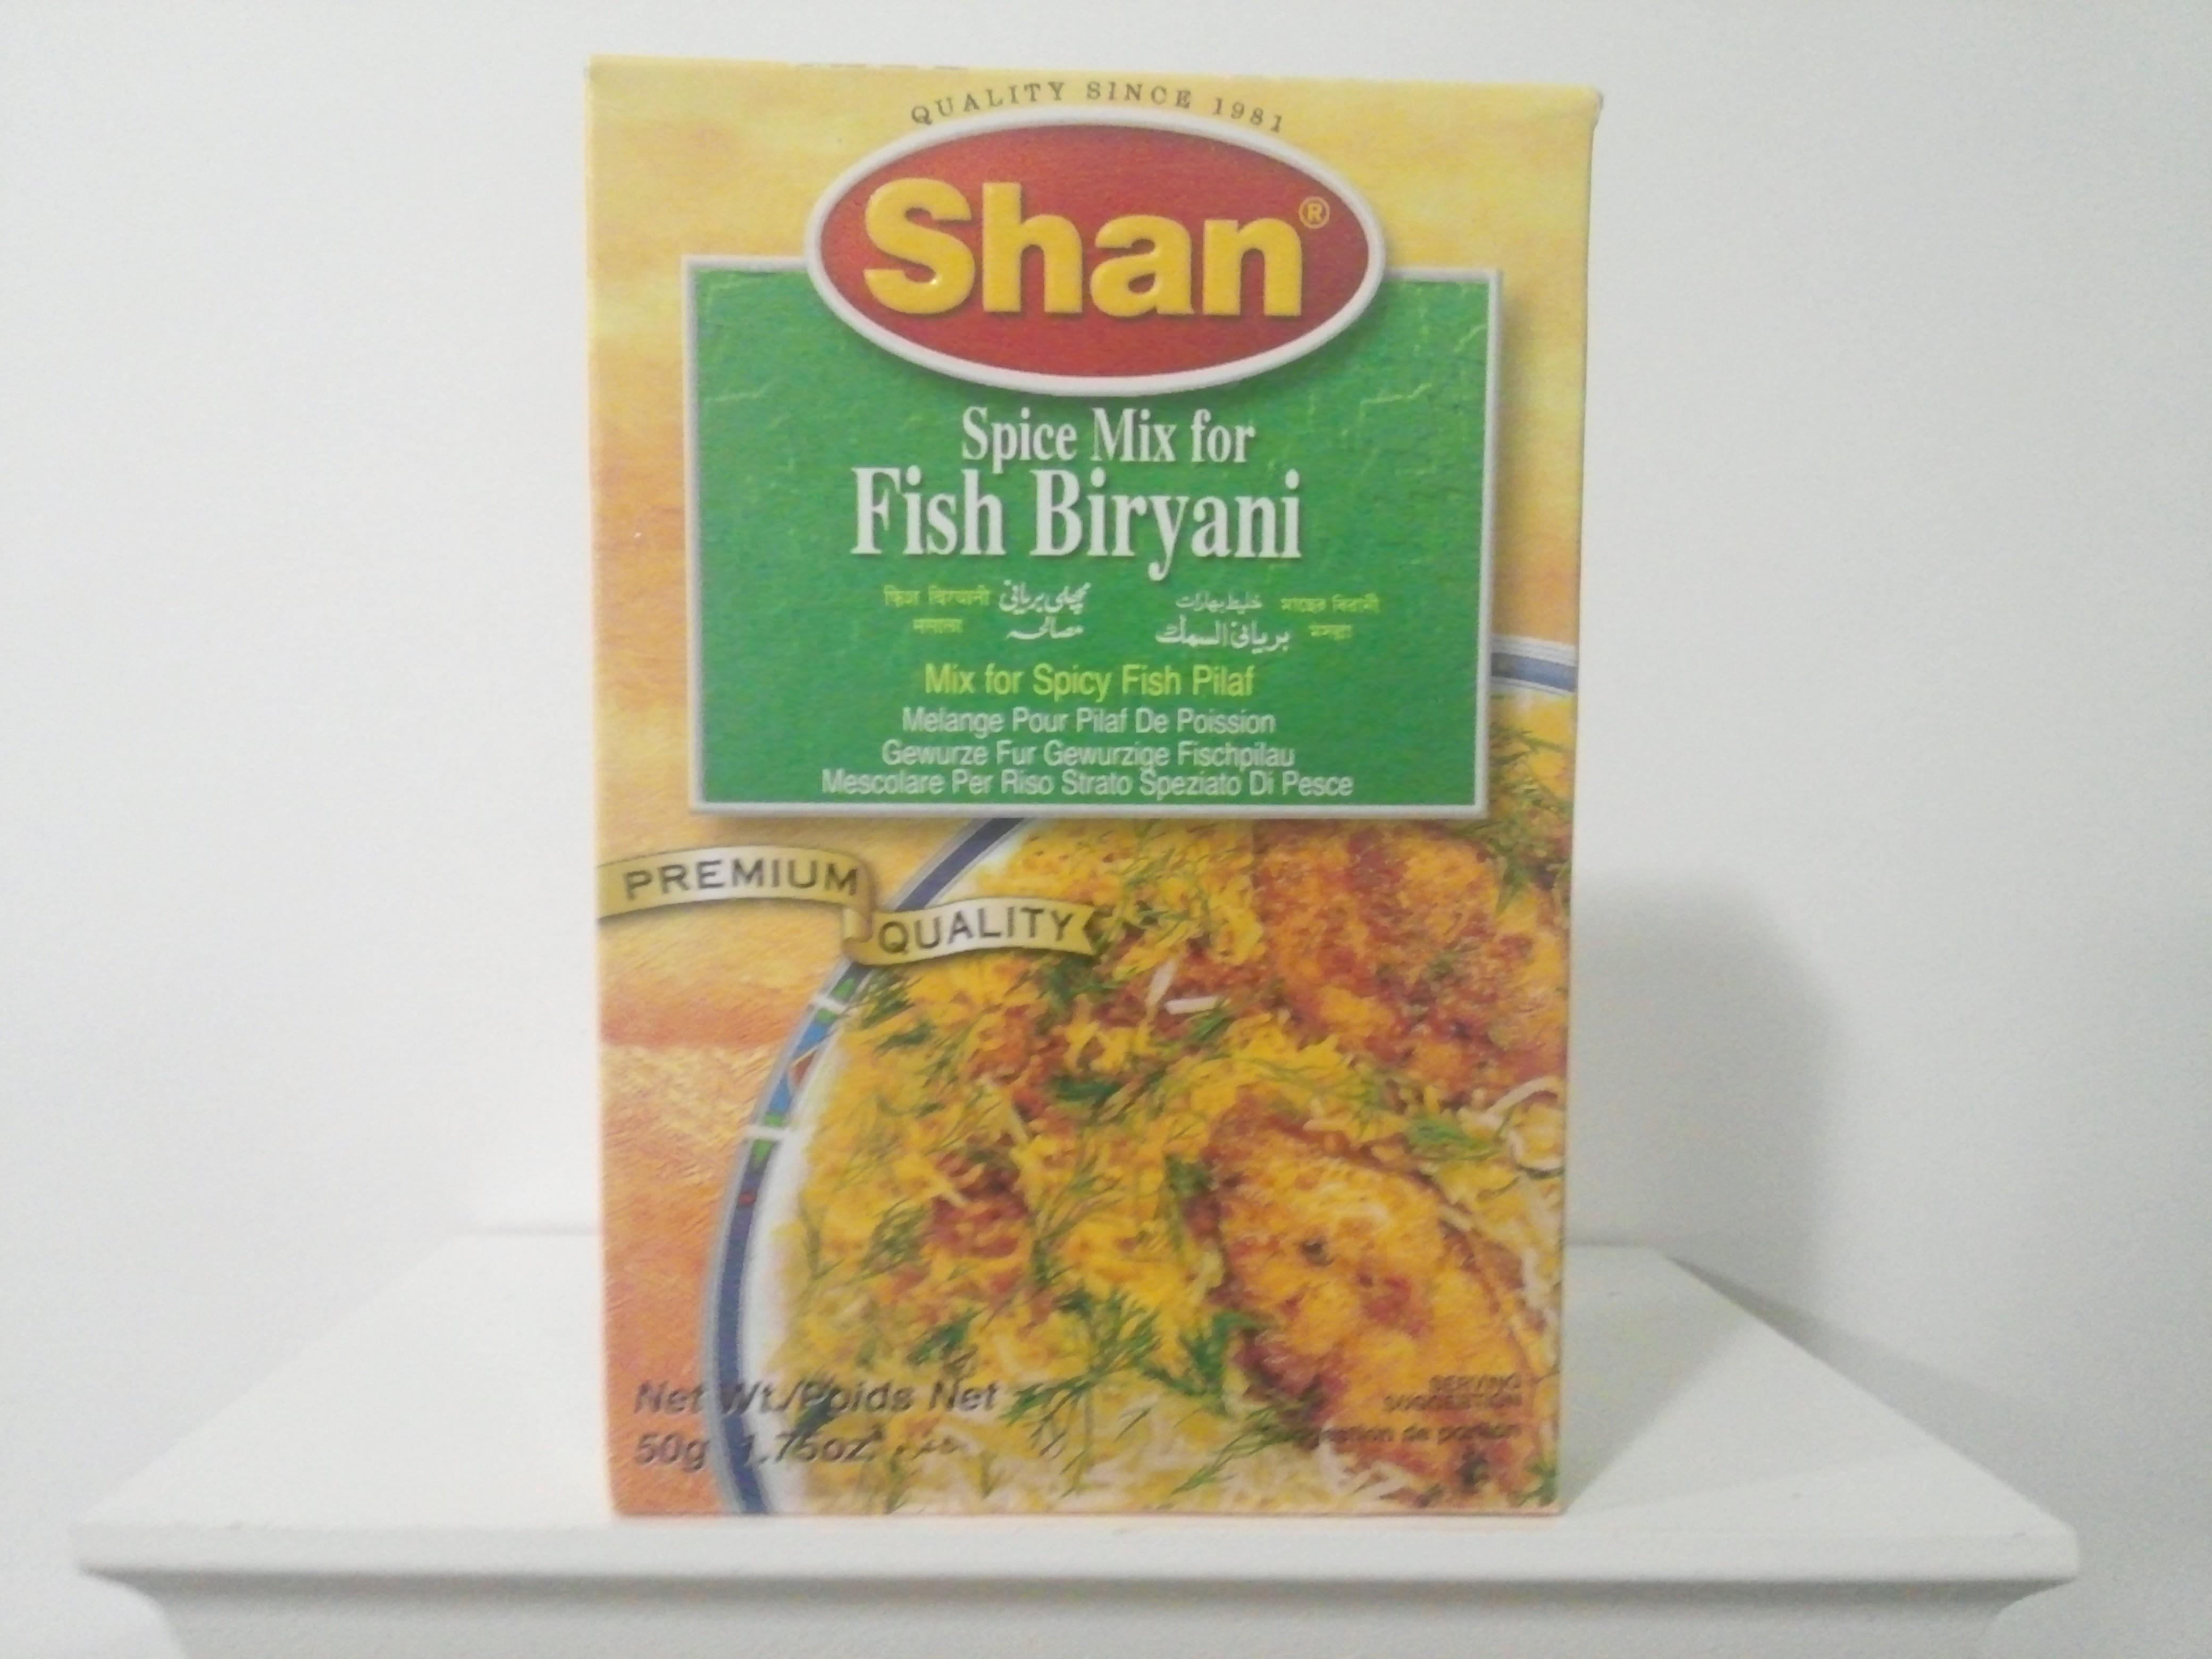 Shan Fish Biryani Spice Mix 50 grm